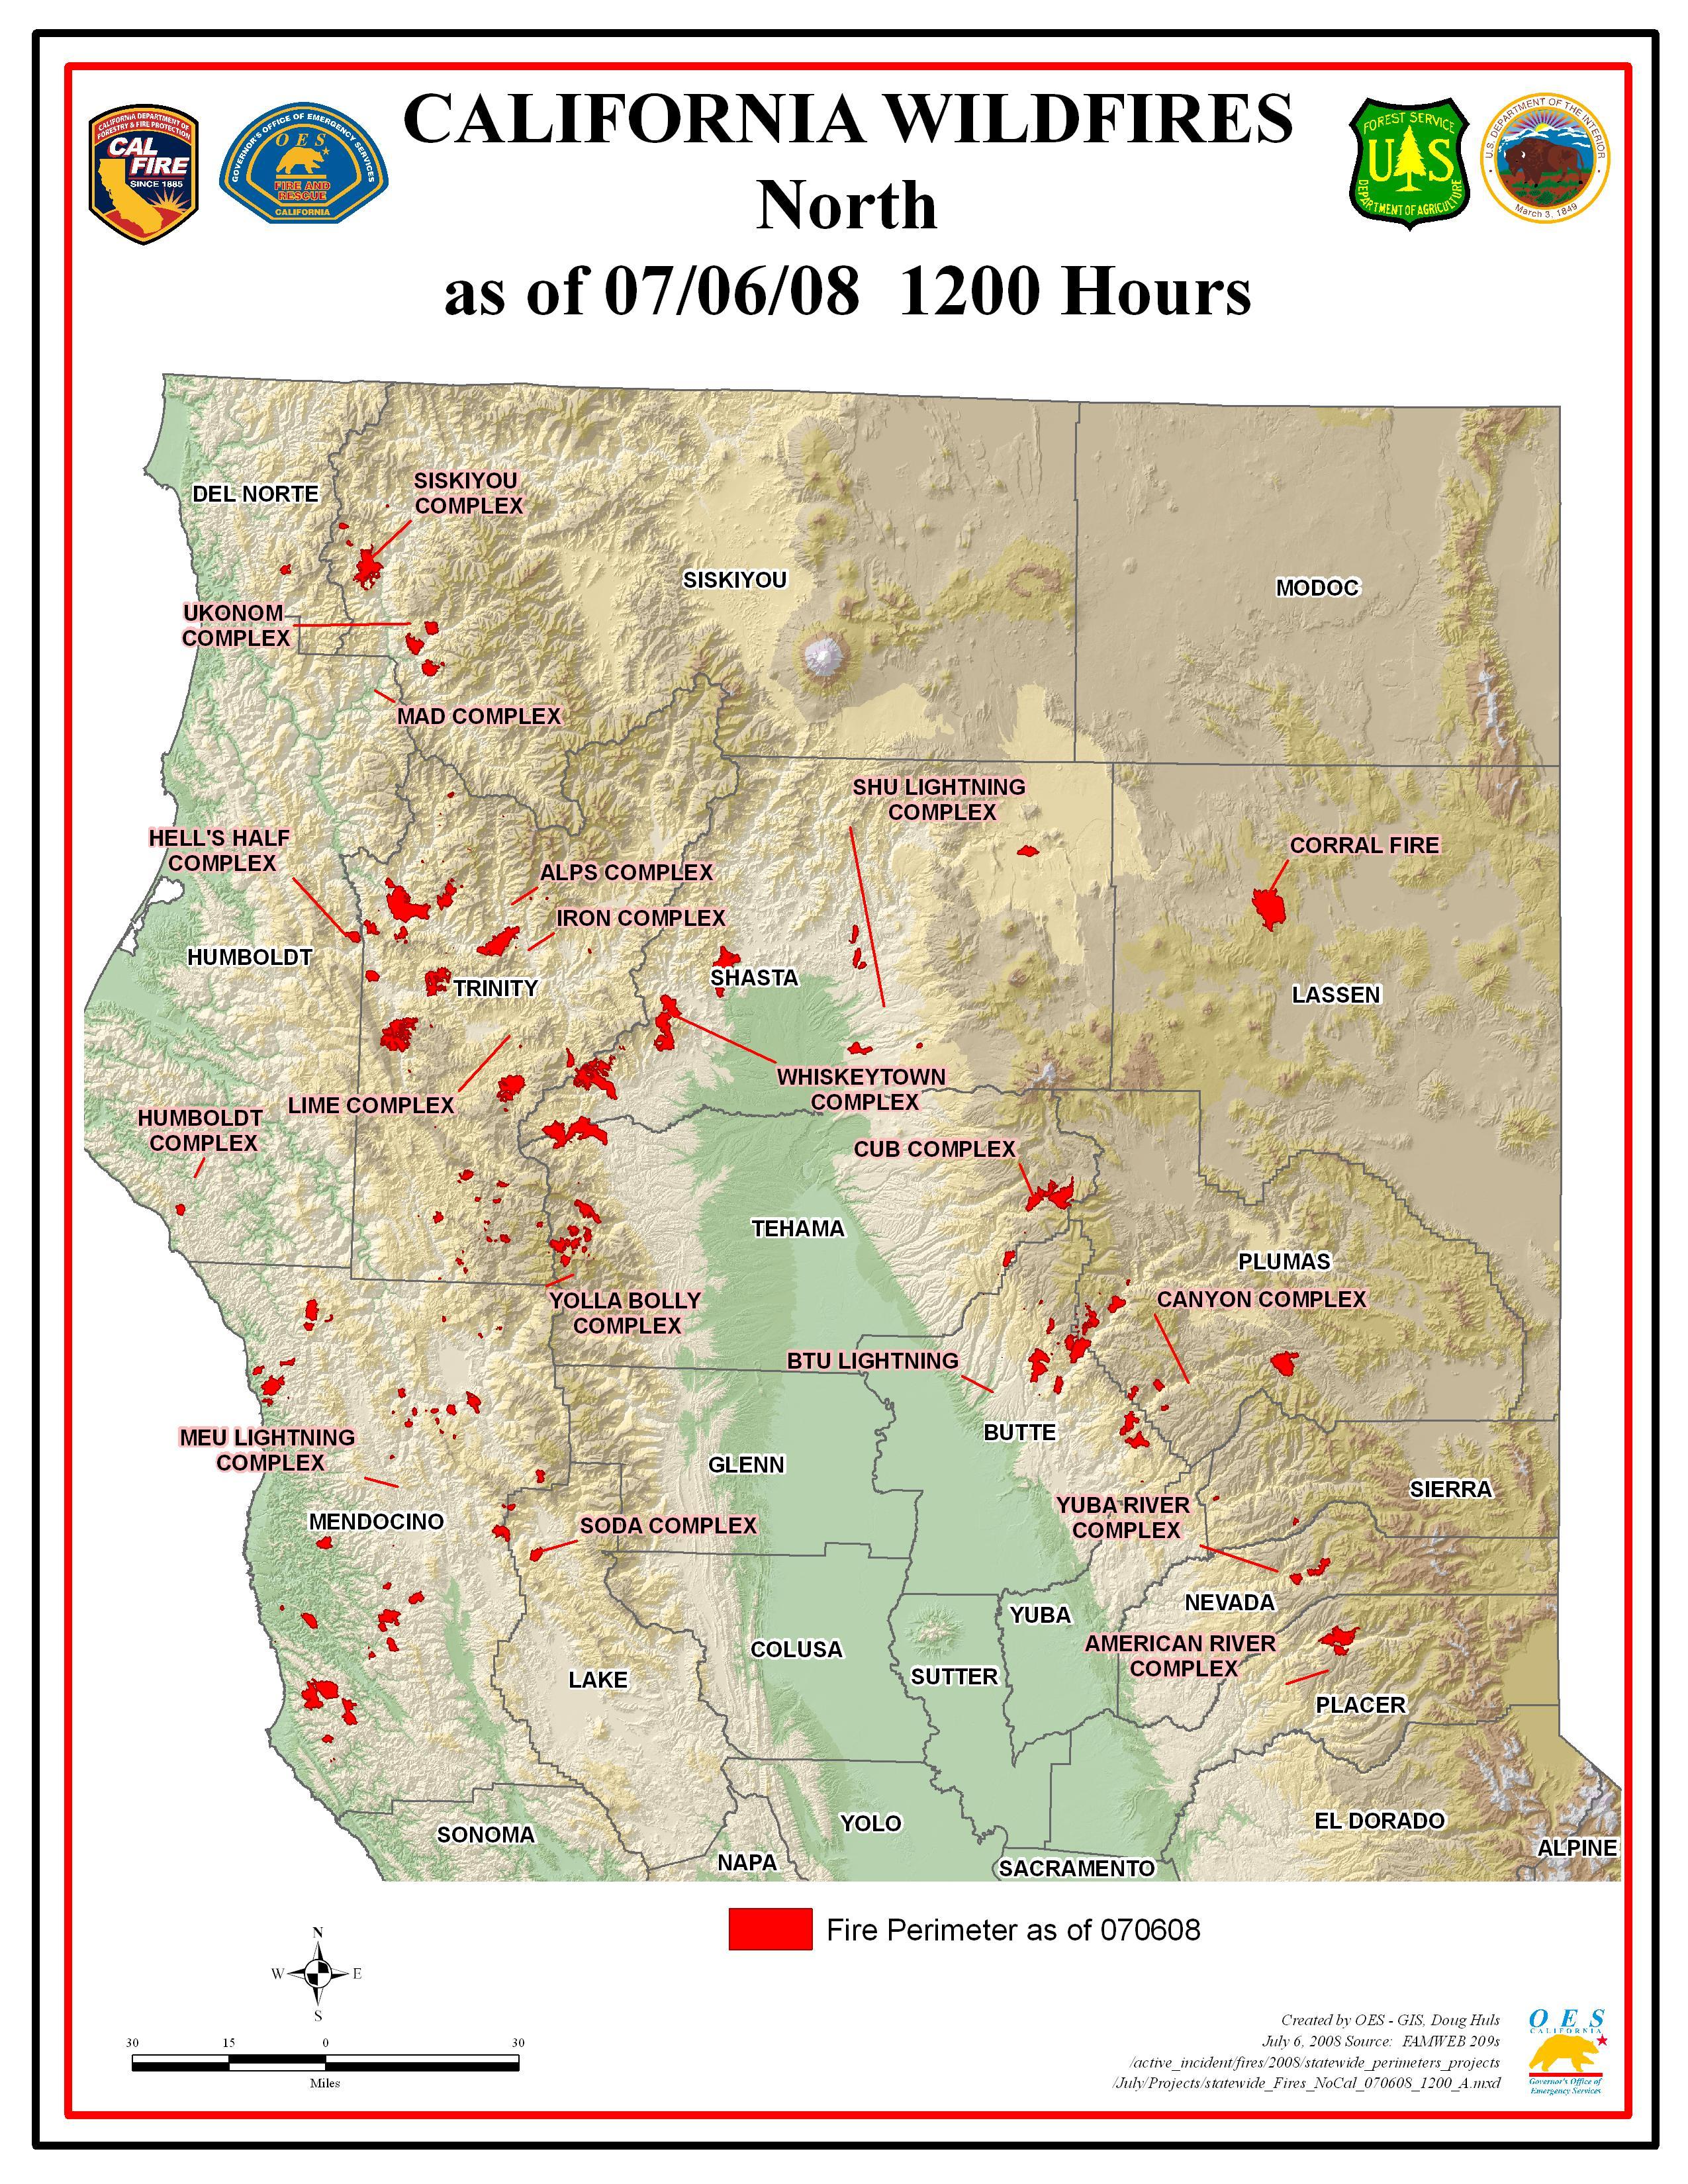 California Fires Map California Road Map Current Fires California - California Fire Map Now